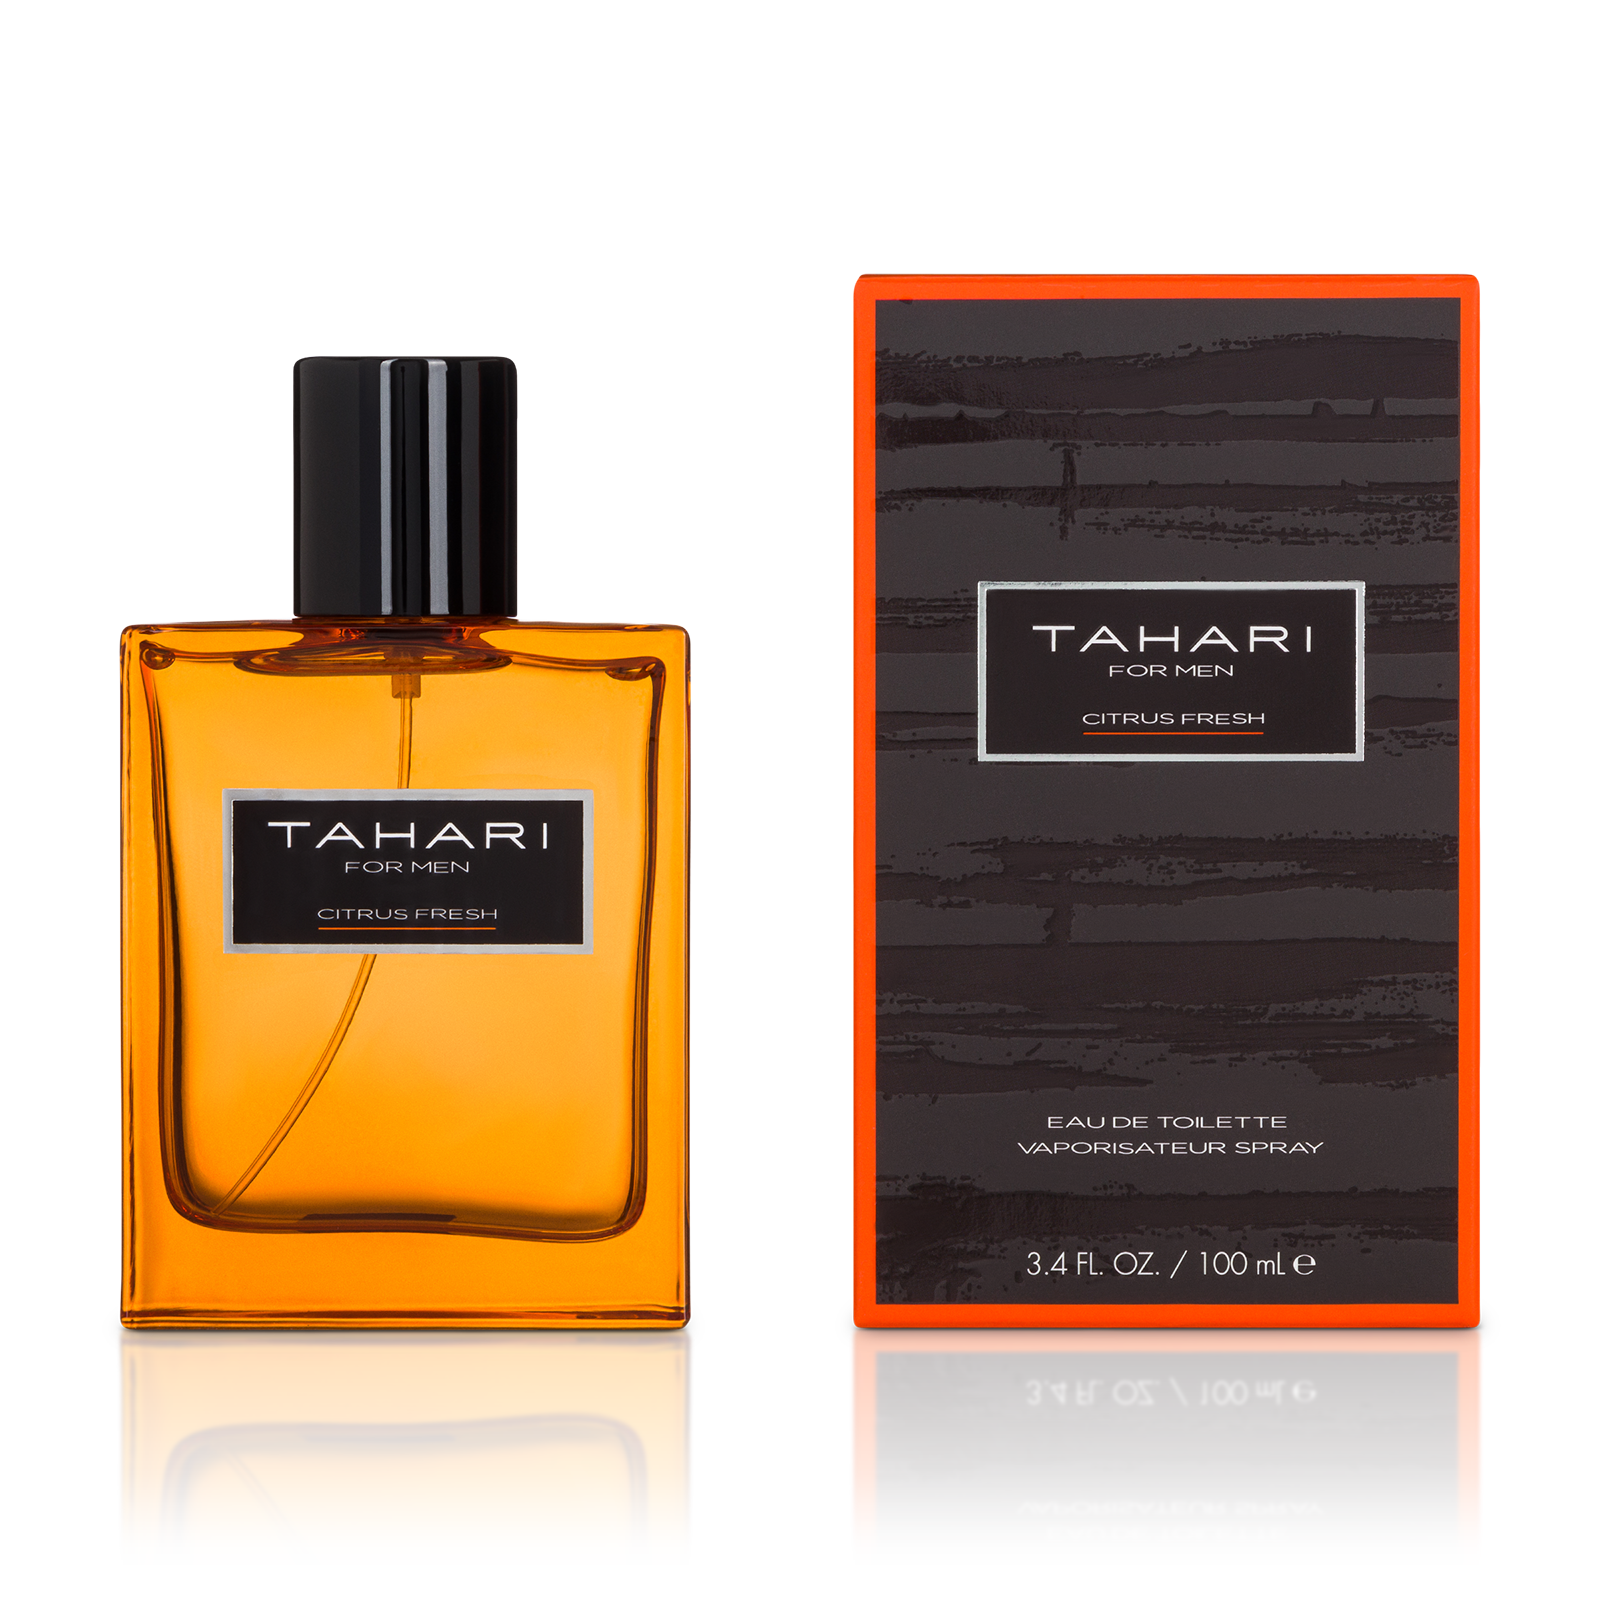 Perfume product photo